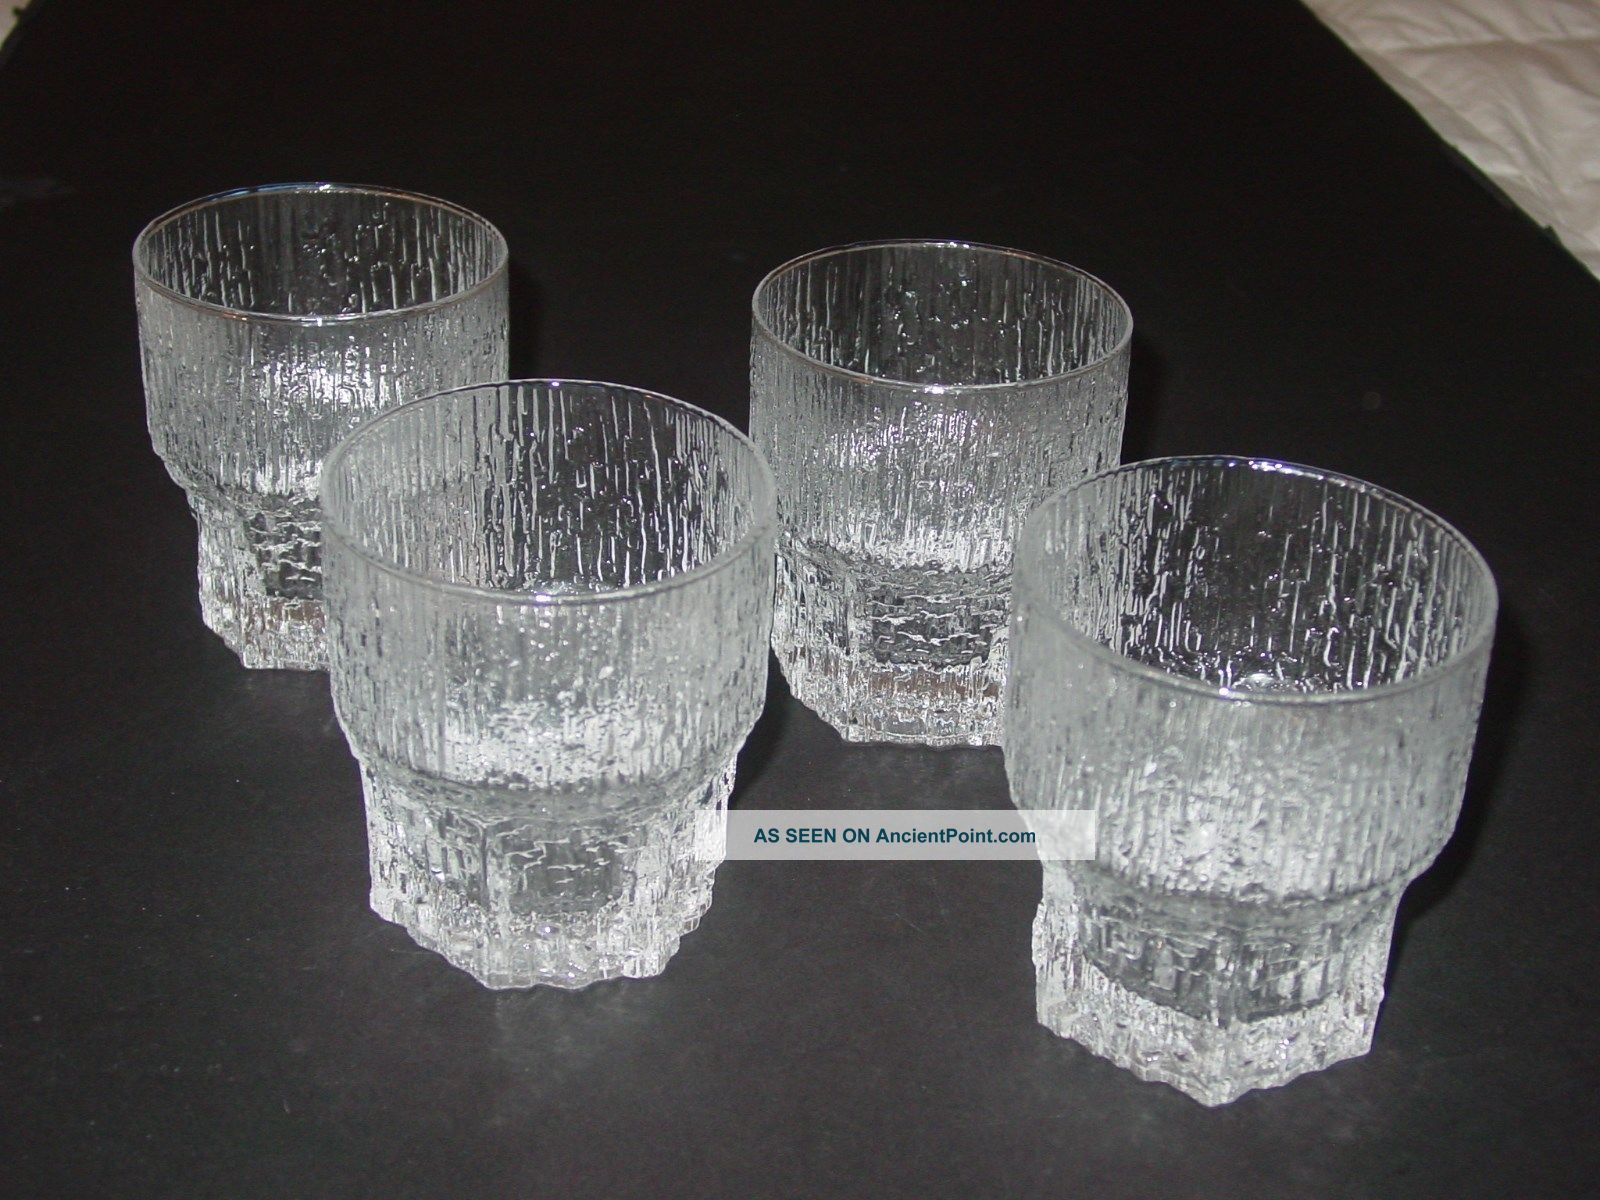 Aslak Tapio Wirkkala Iittala Old Fashioned 4 Glasses Modern Mid Century Danish Mid-Century Modernism photo